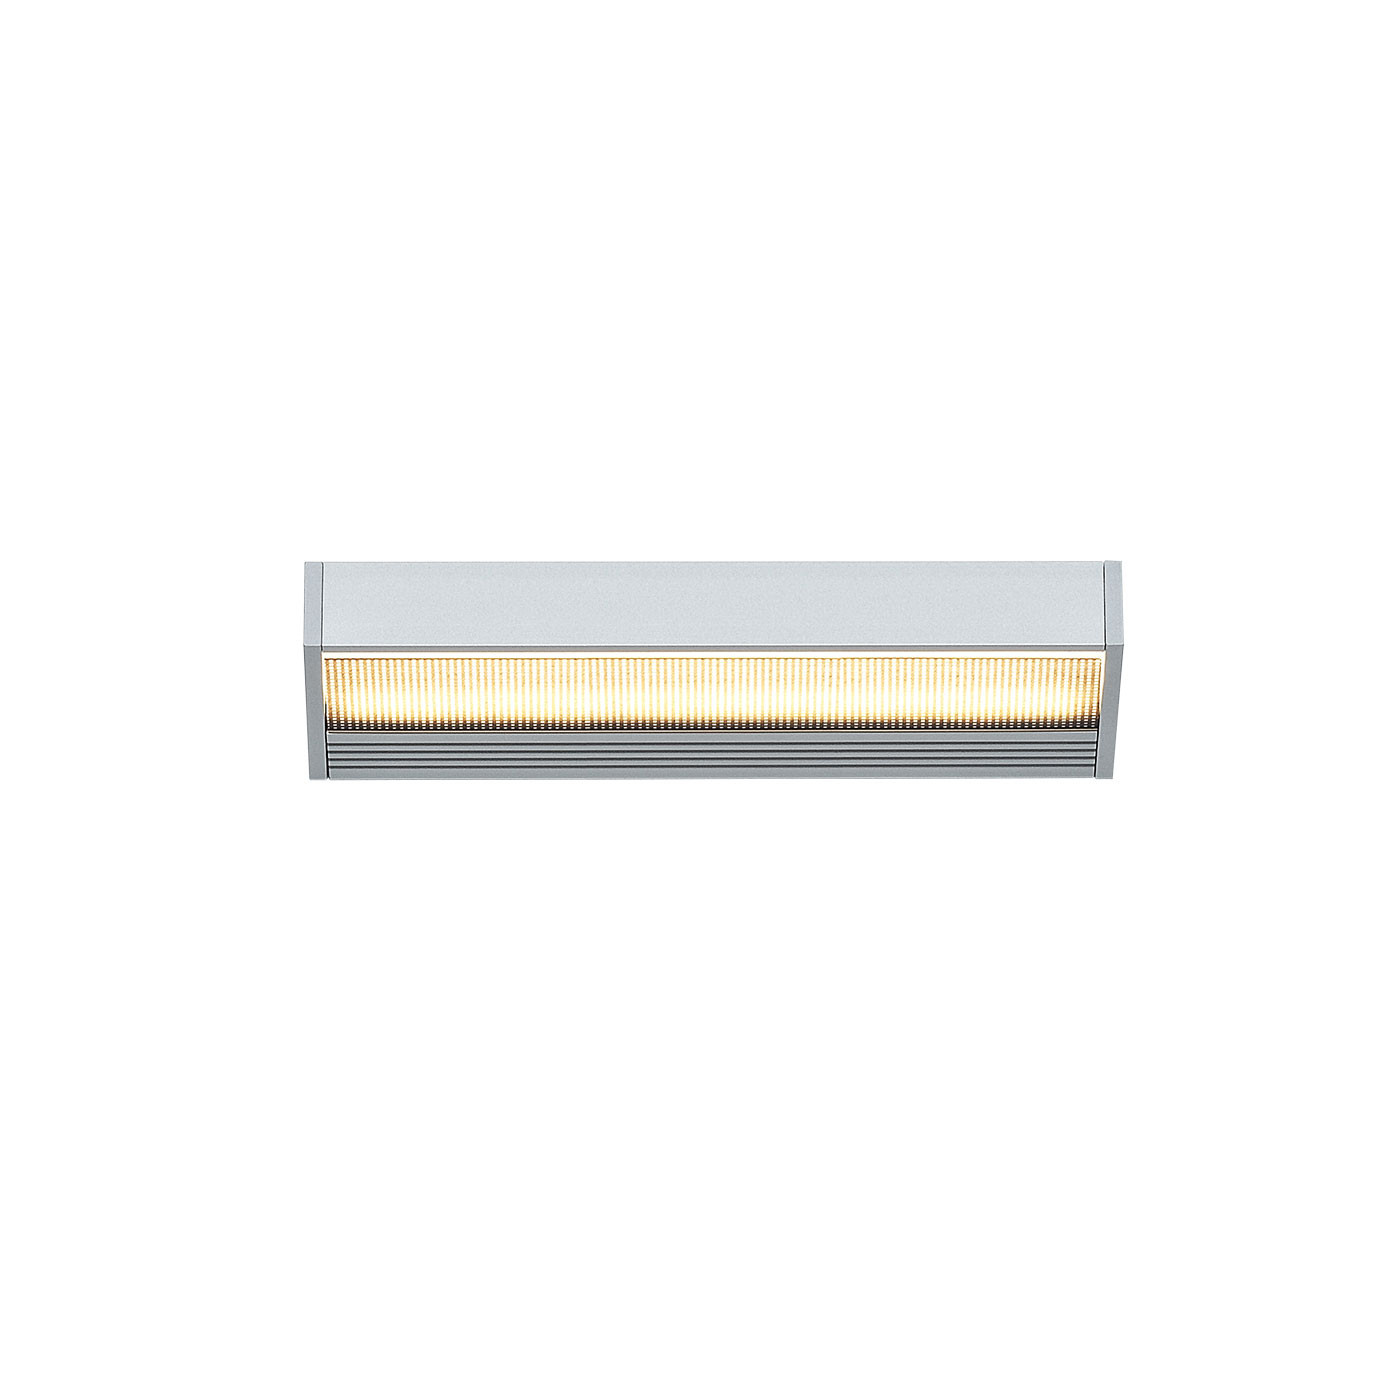 Serien Lighting SML² Wall 220, 2700K